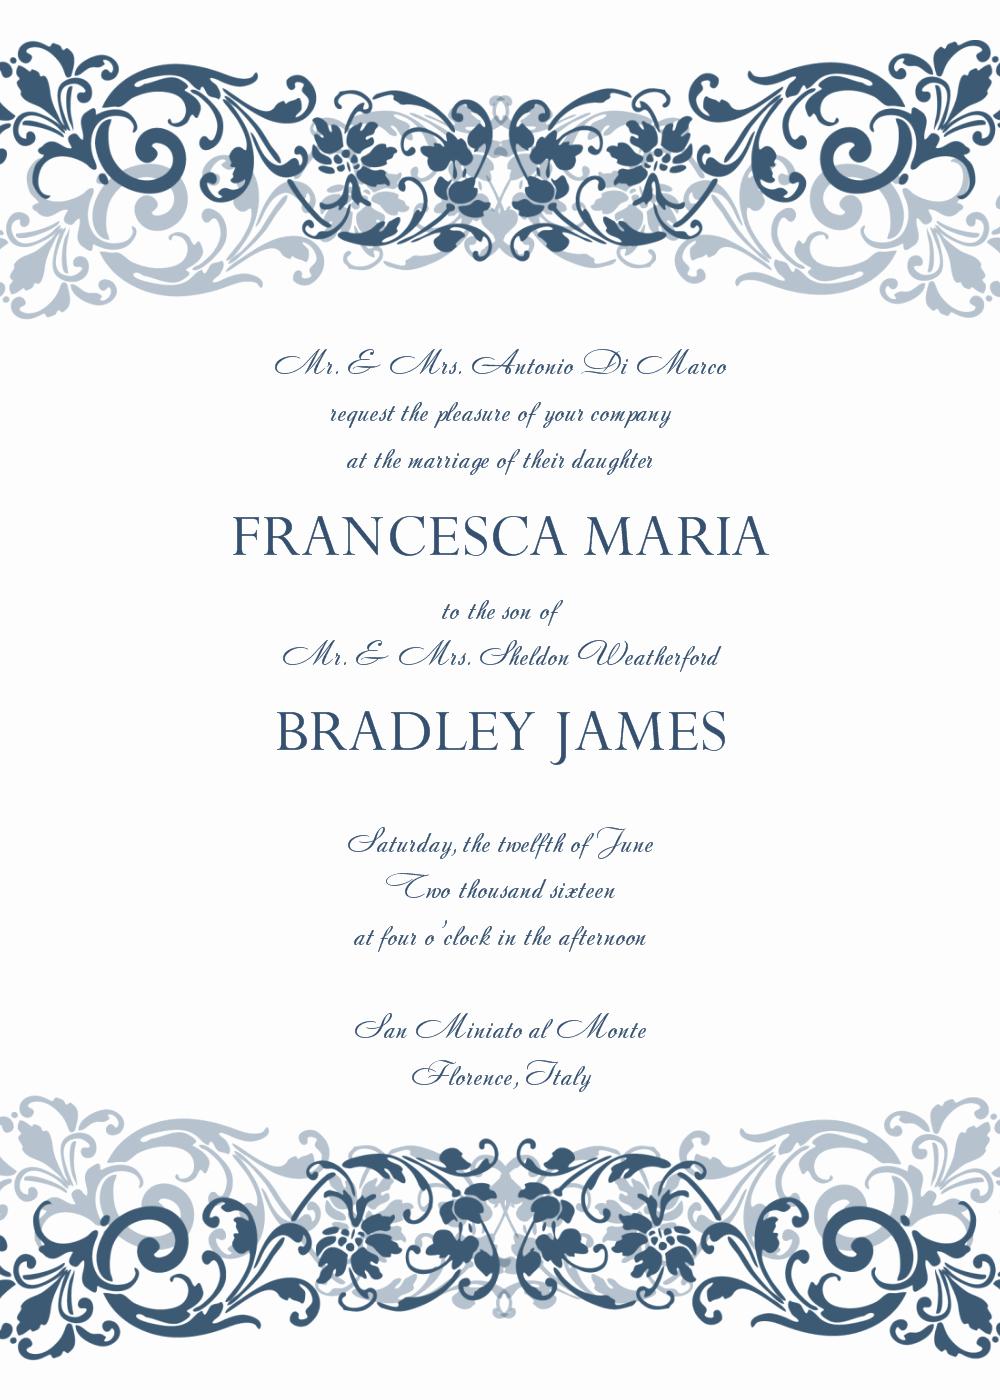 Free Printable Invitation Templates Beautiful 8 Free Wedding Invitation Templates Excel Pdf formats